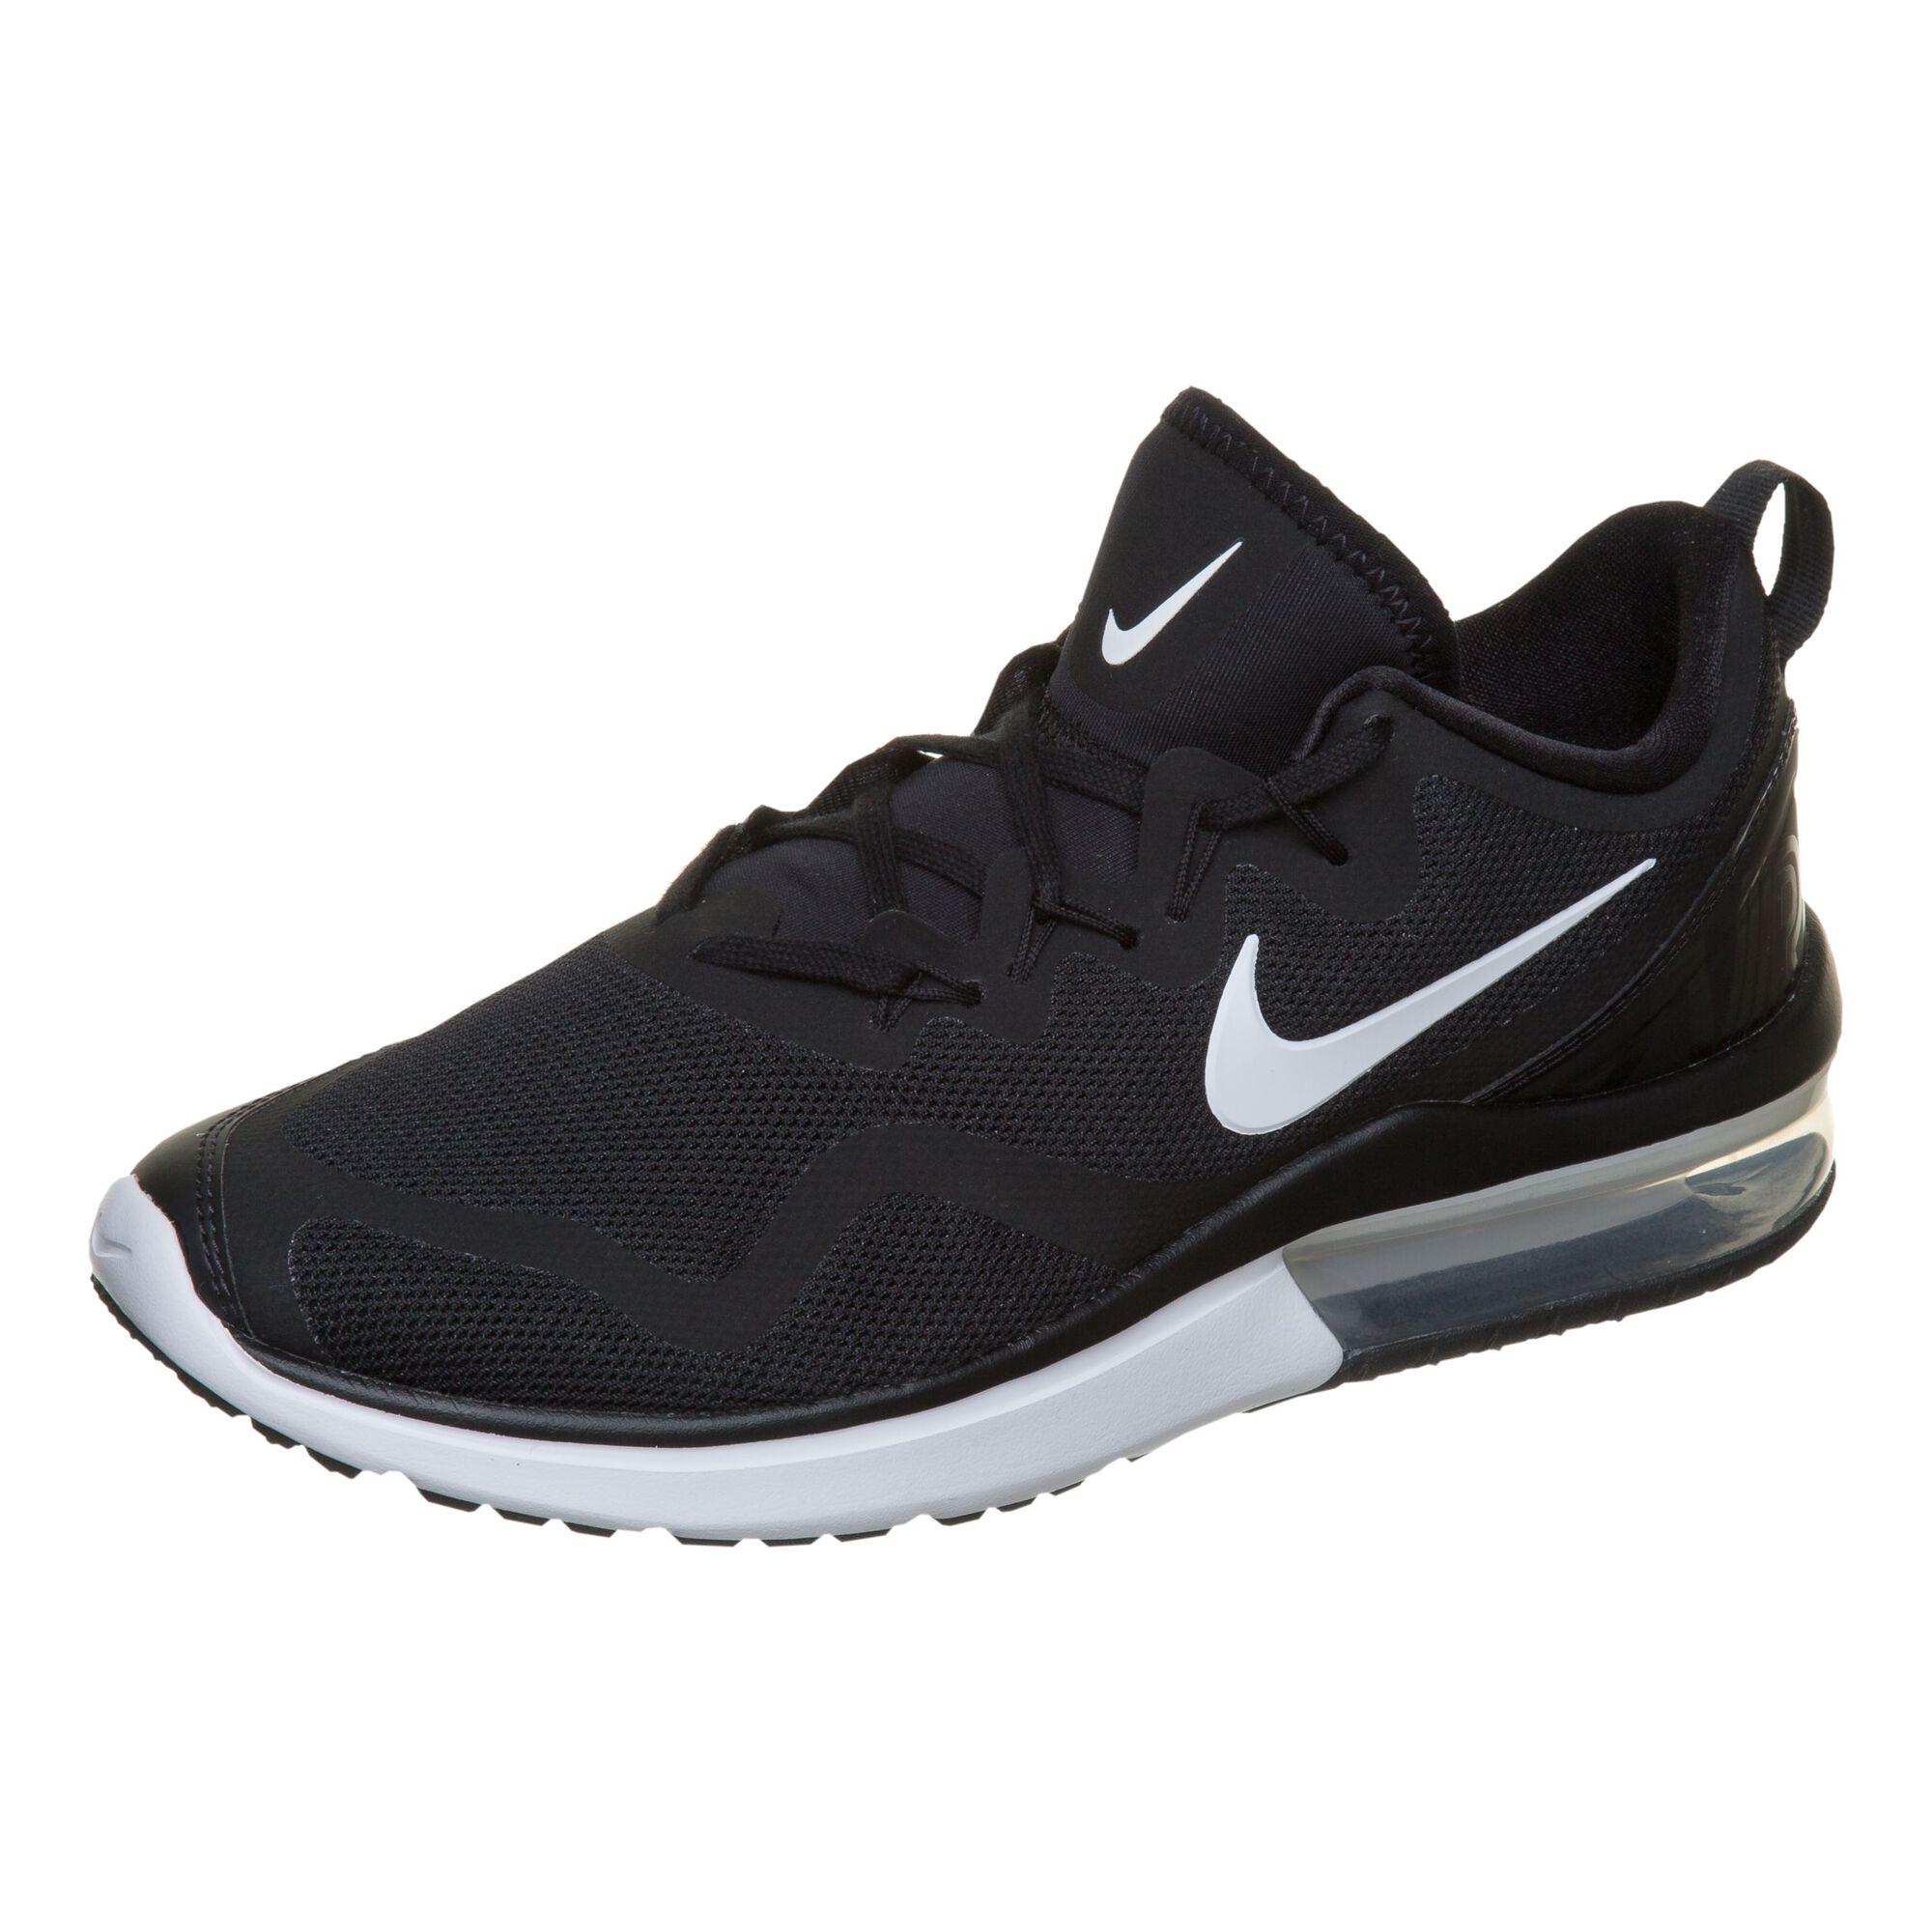 Nike  Nike  Nike  Nike  Nike  Nike  Nike  Nike  Nike  Nike. Air Max Fury  Women ... 6f8c0fe90